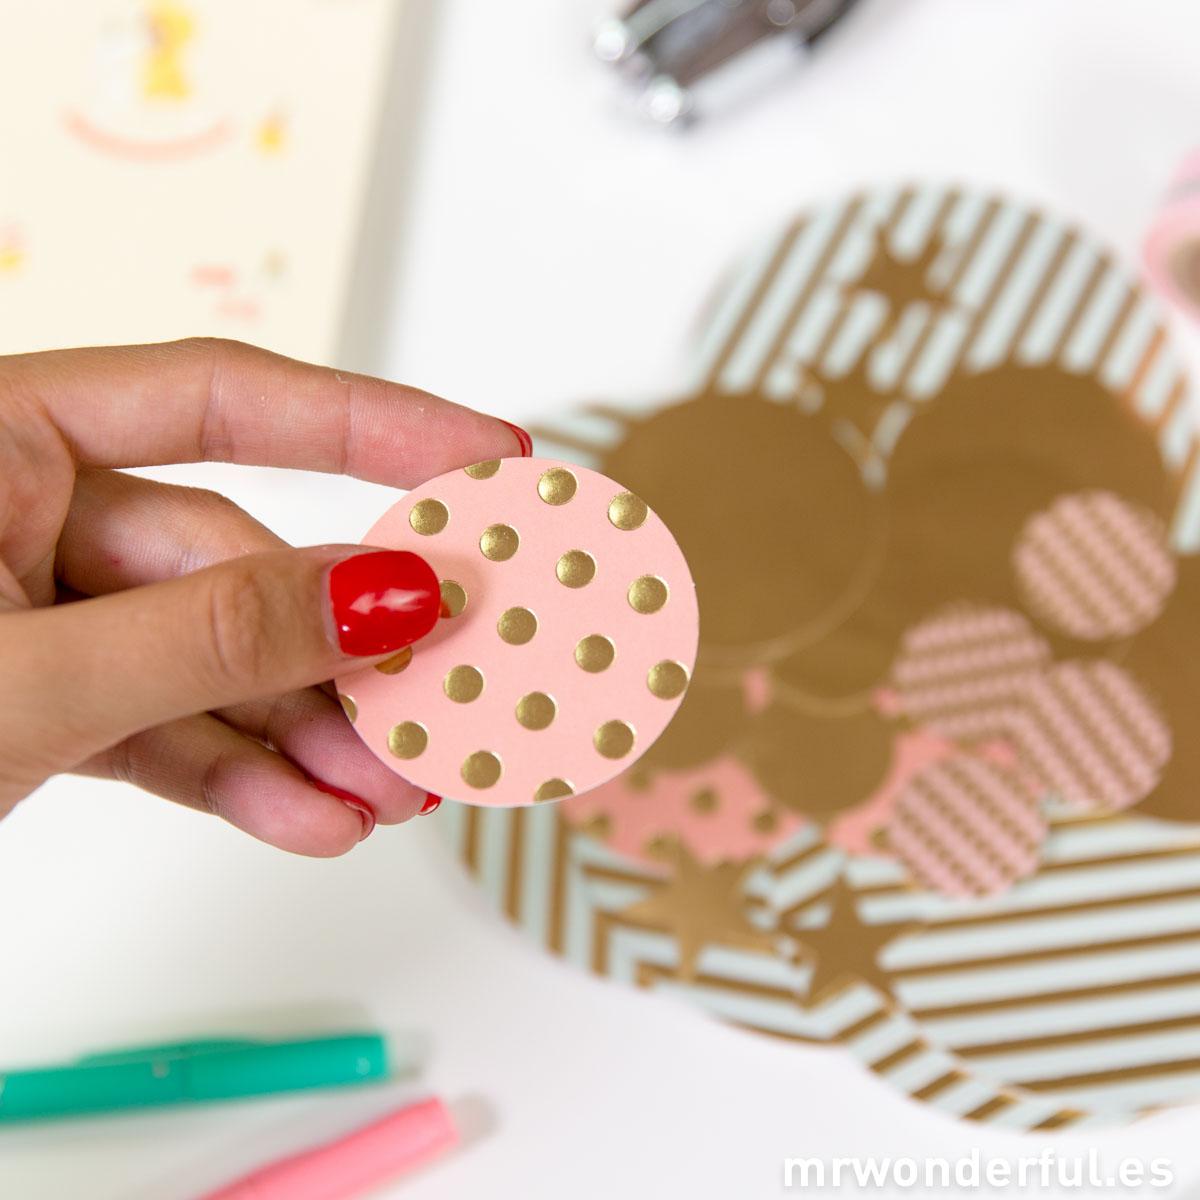 mrwonderful_TRP001_Surtido-confetti-papel-color-dorado-pastel-18